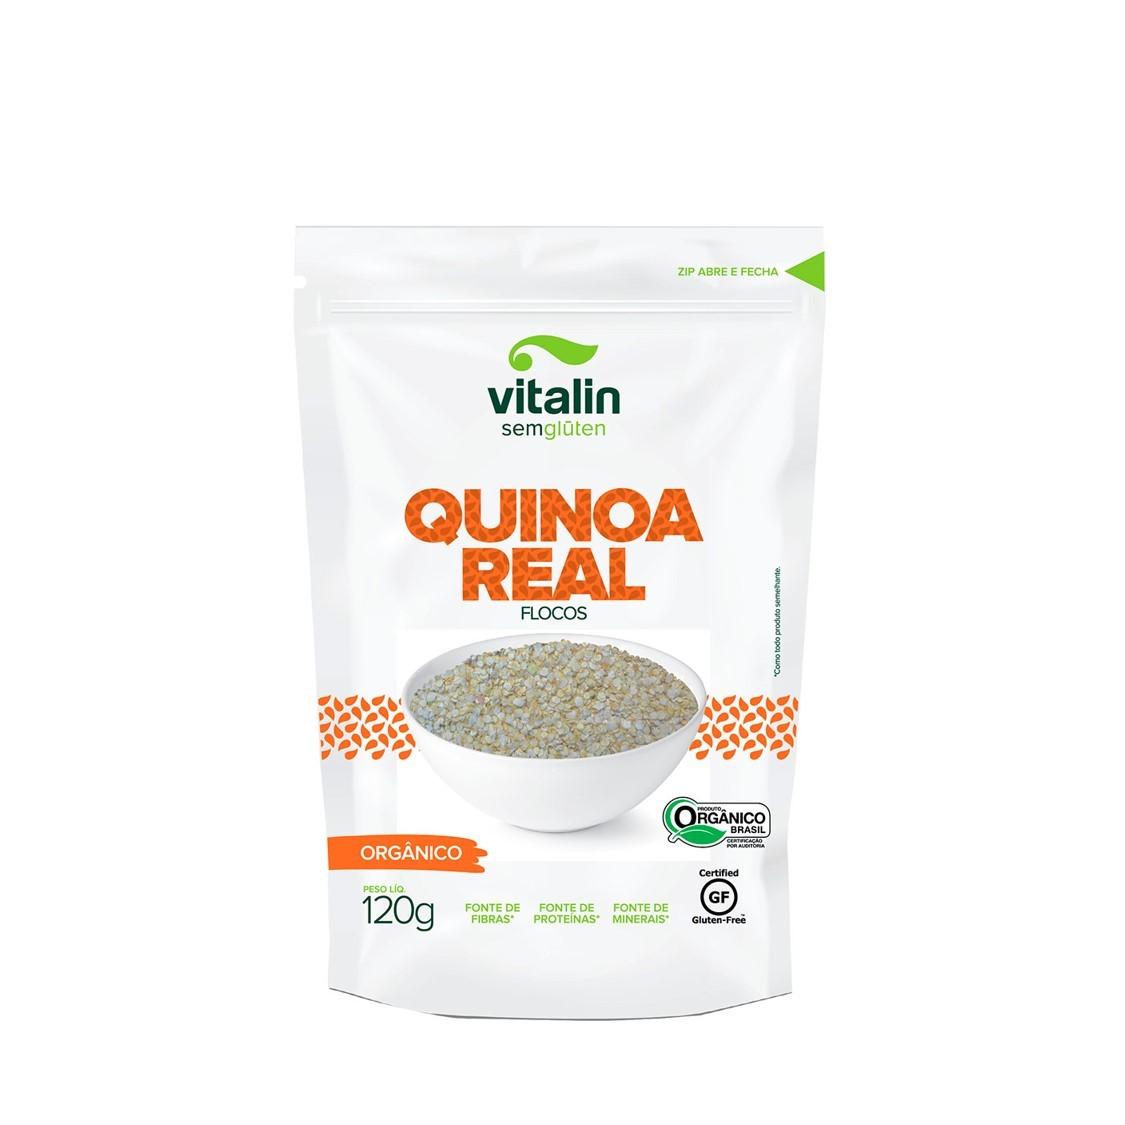 Quinoa em Flocos (120g) – Vitalin